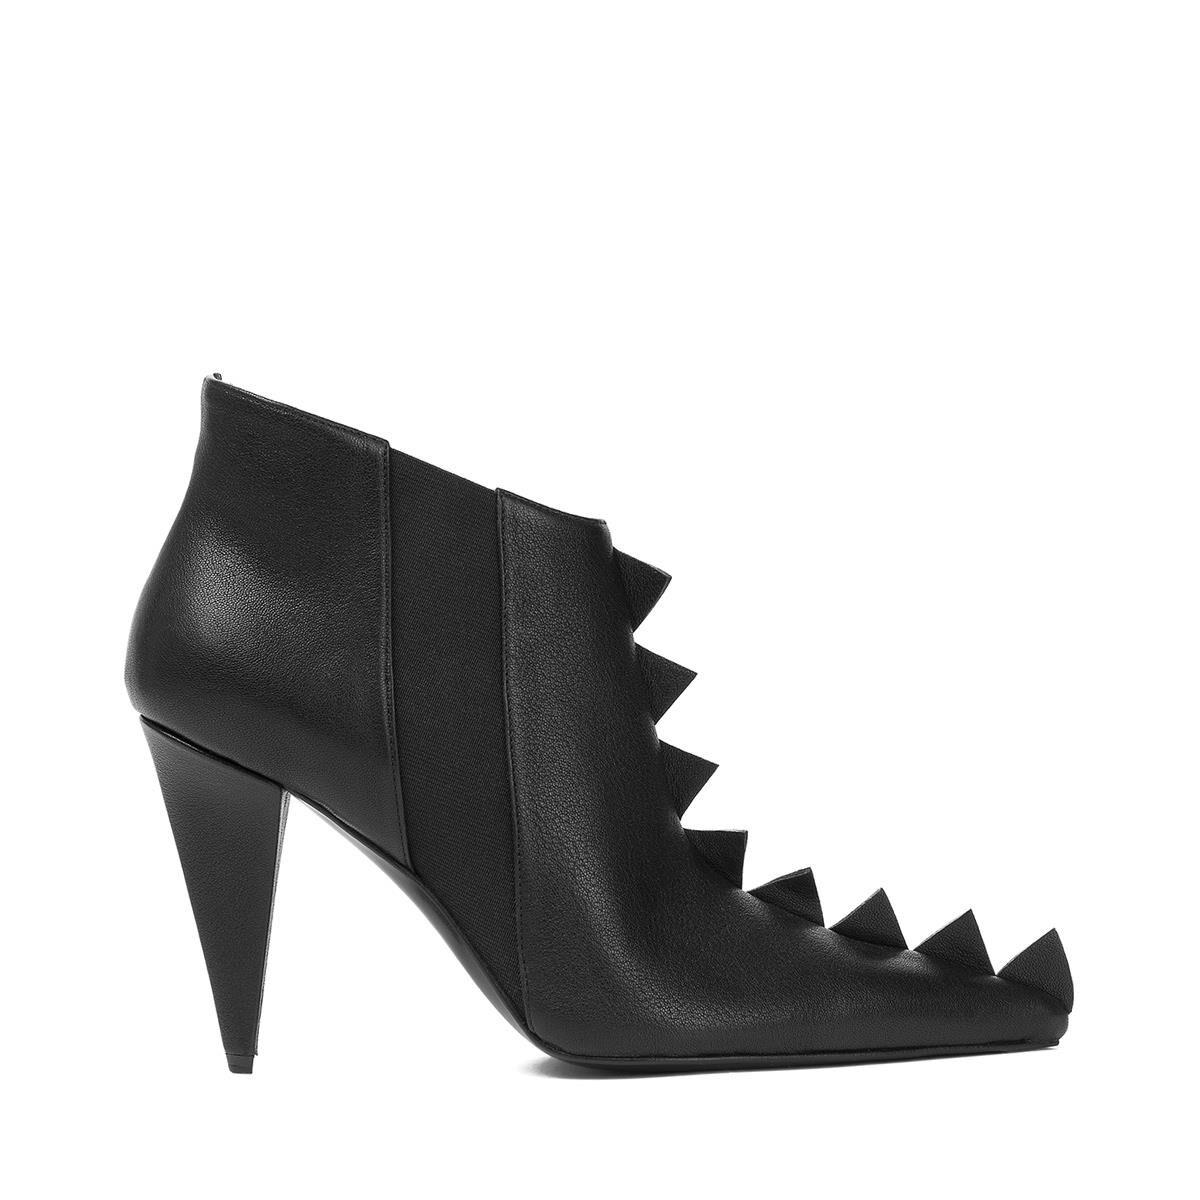 Zig Zag ankle boots - Black Loewe ATuULqV